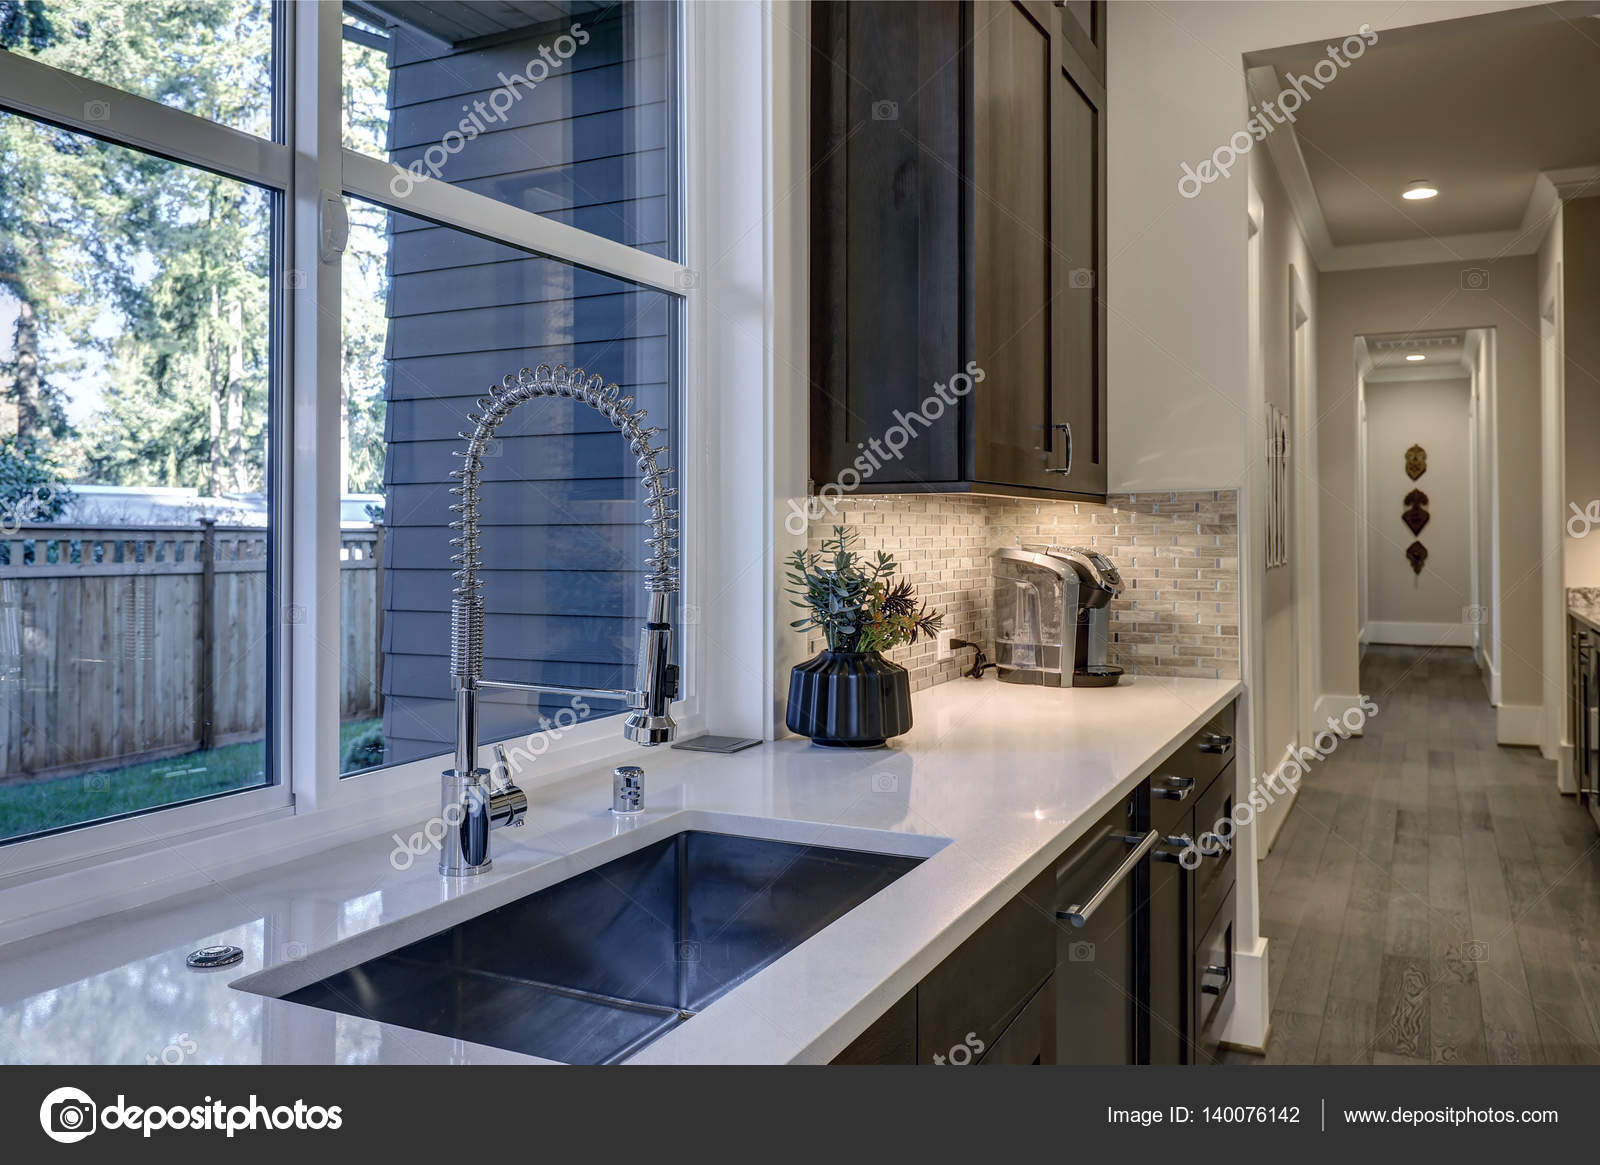 Contemporary Kitchen Design With Brown Kitchen Cabinets